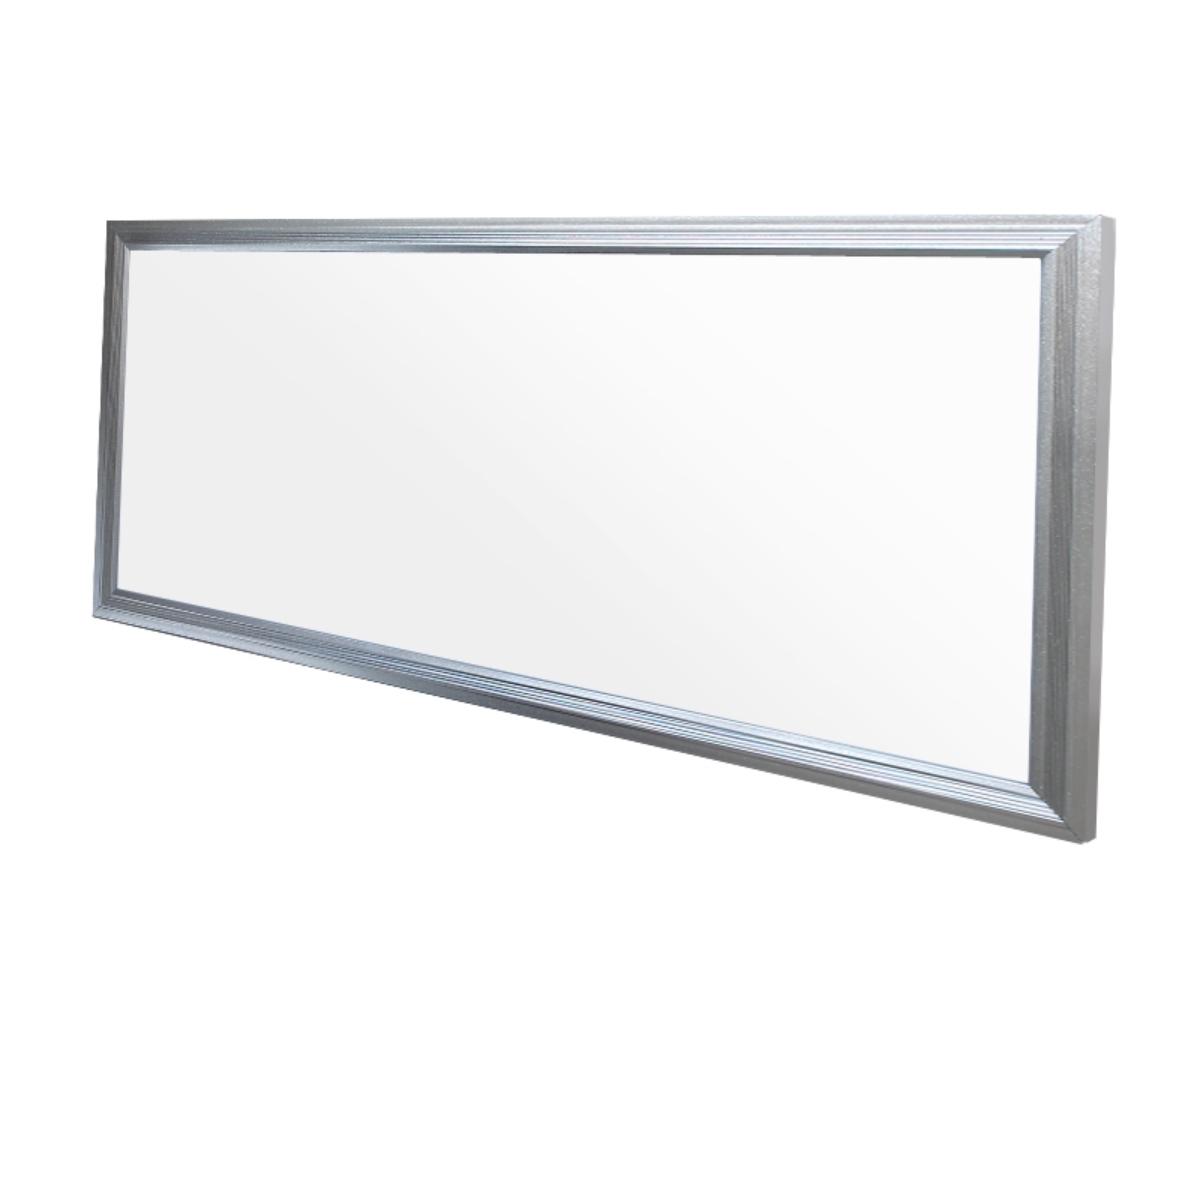 led panel 60x30 cm 18watt lampe deckenleuchte neutralwei wandleuchte ebay. Black Bedroom Furniture Sets. Home Design Ideas